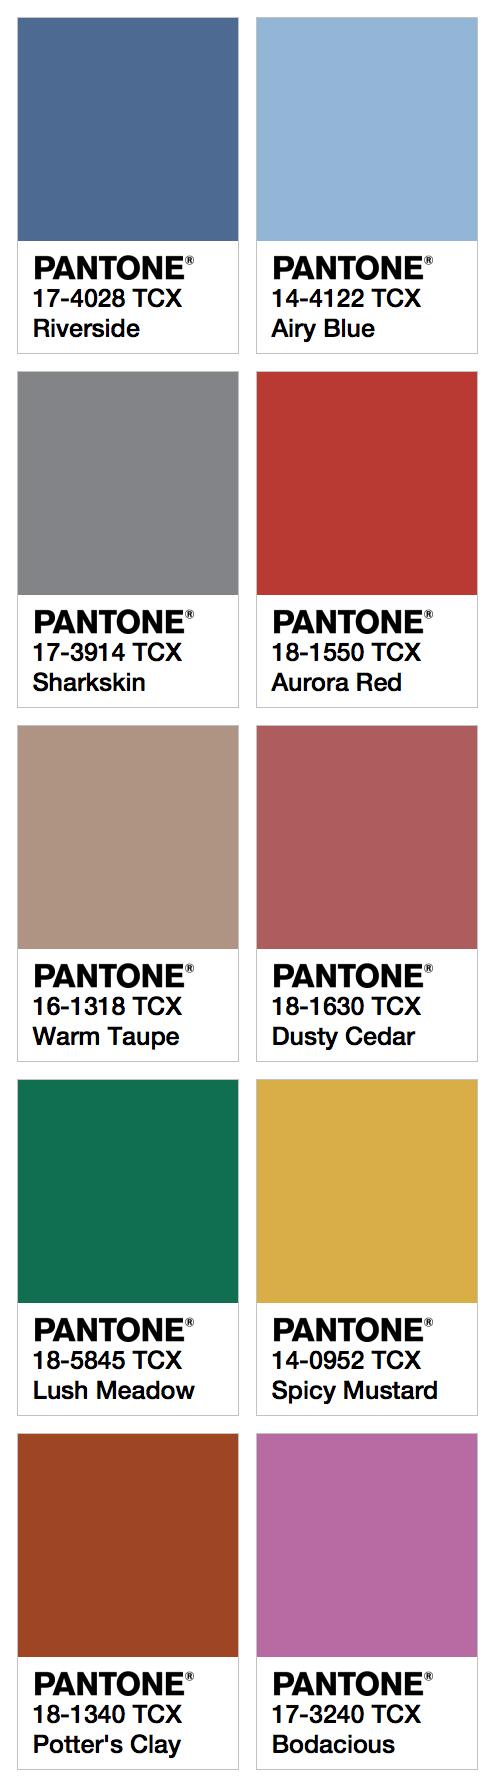 Top Ten Colors For Fall 2016